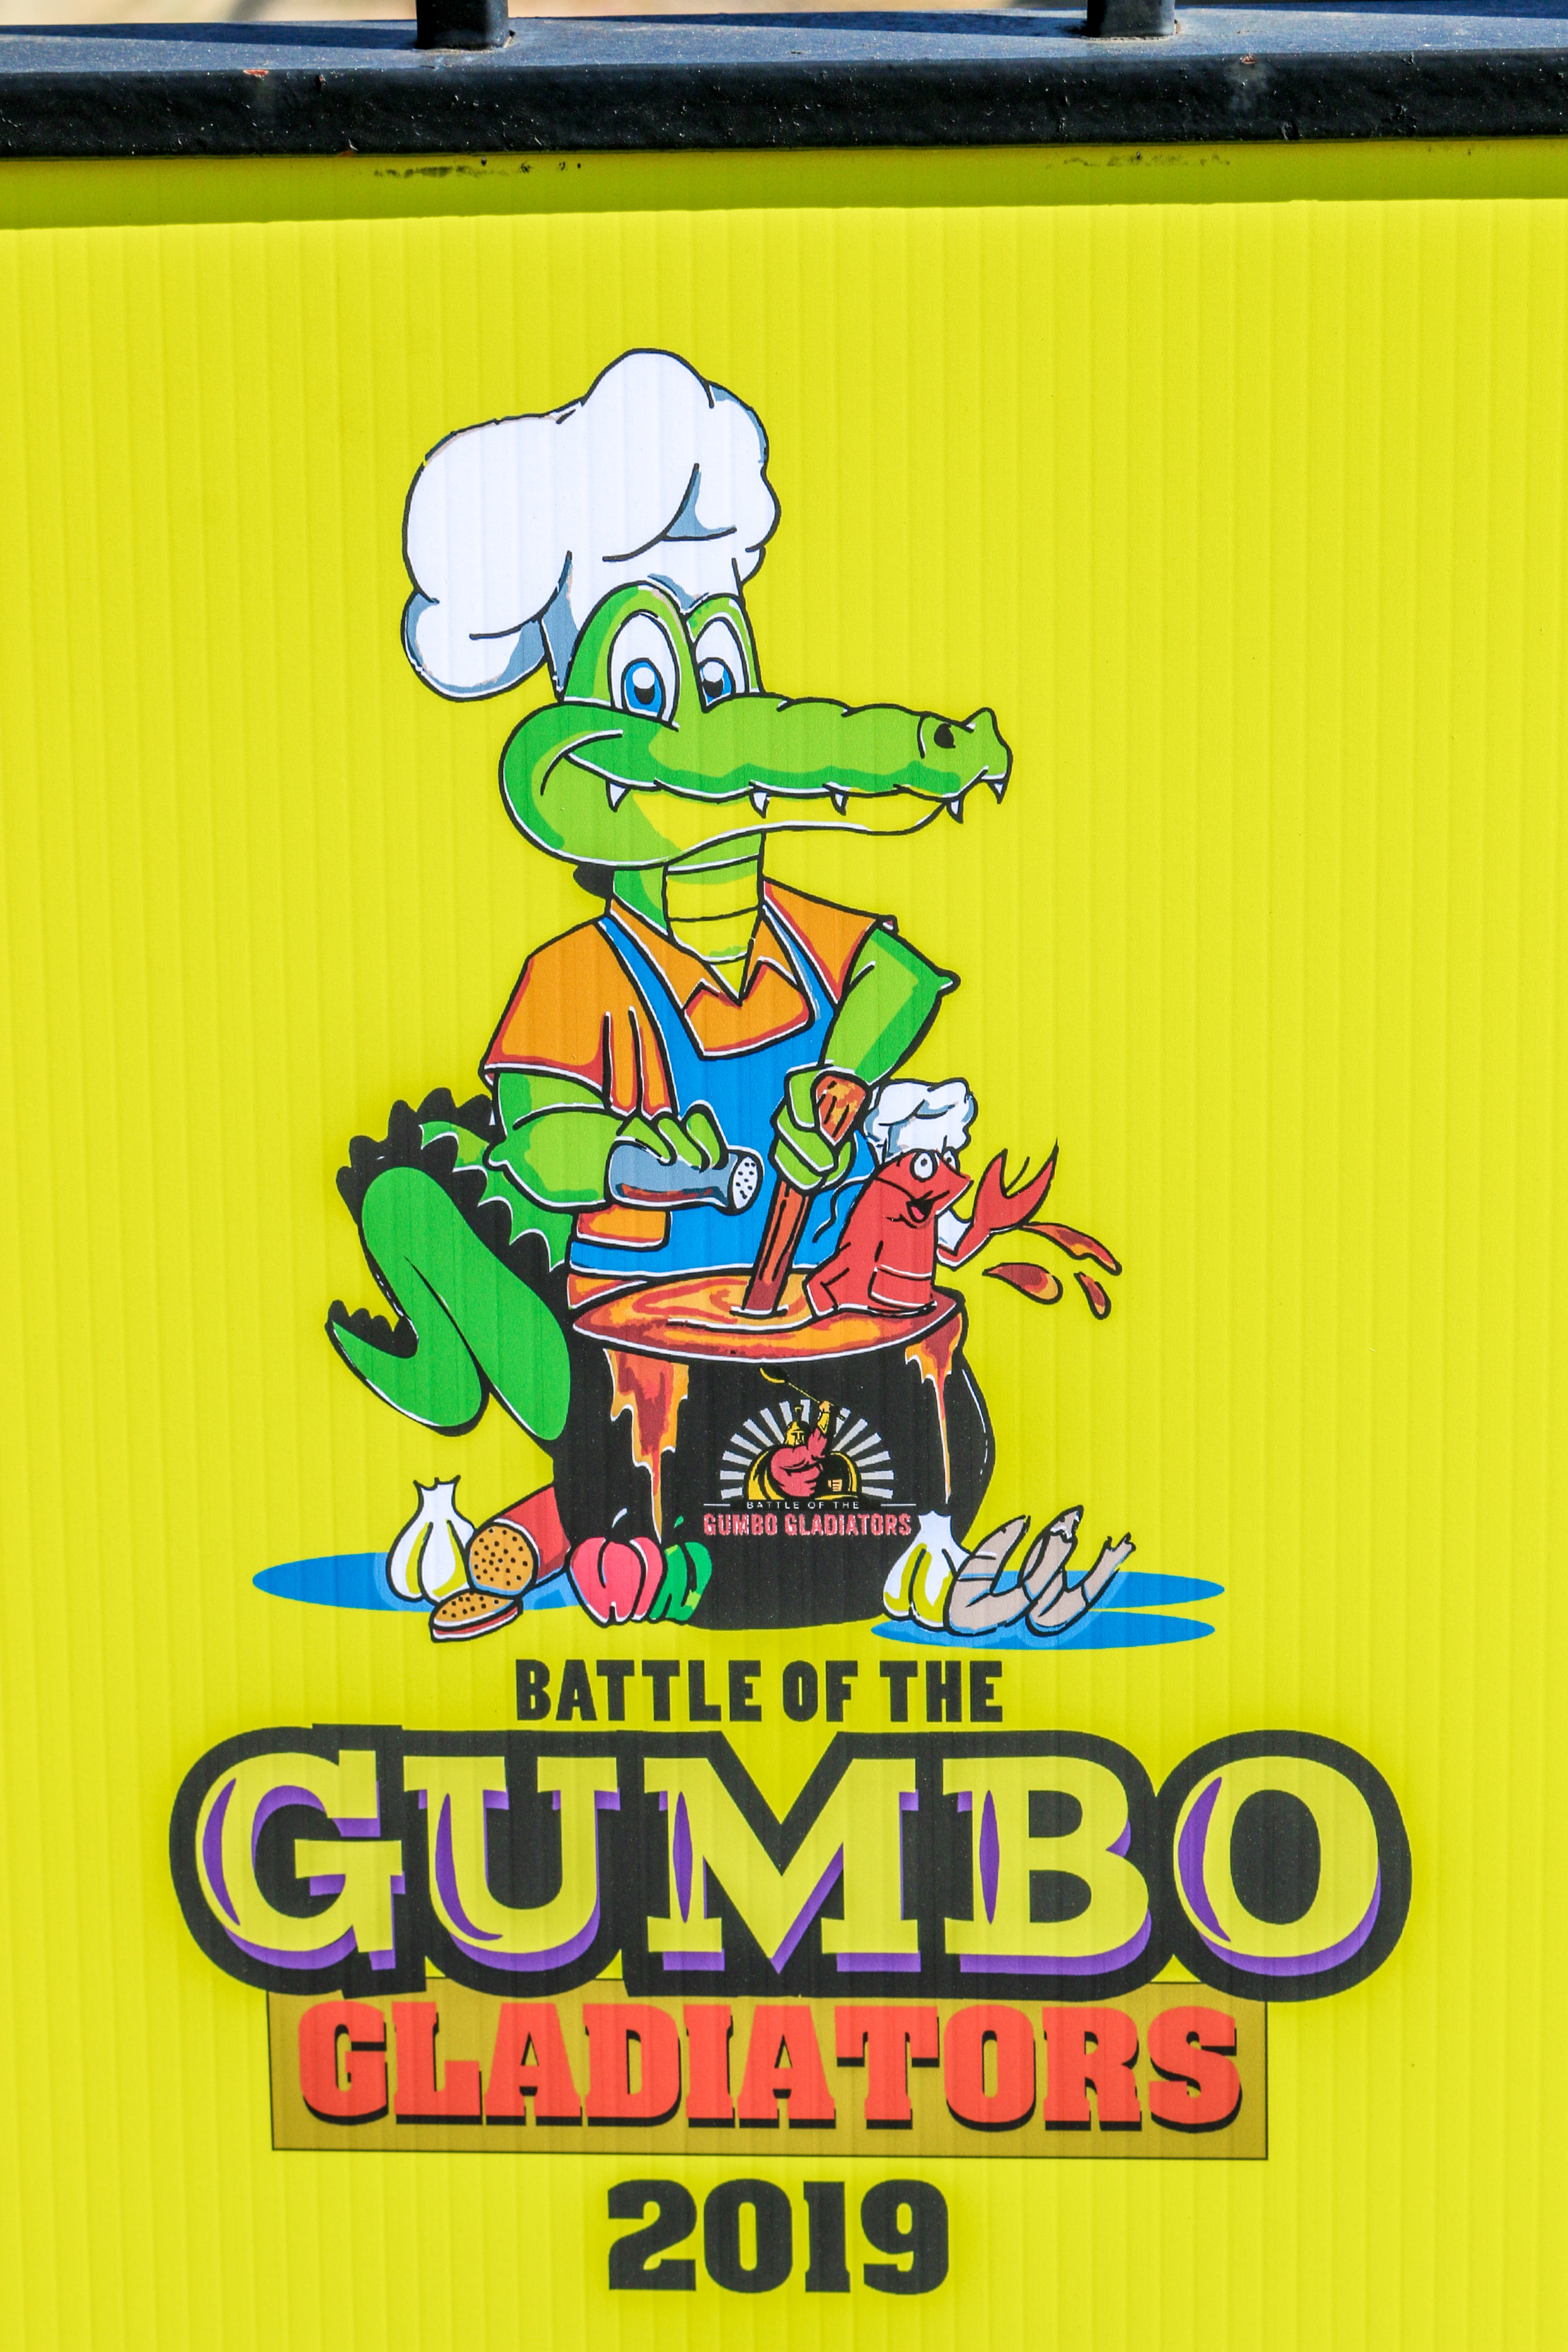 Battle of the Gumbo Gladiators Shreveport Louisiana